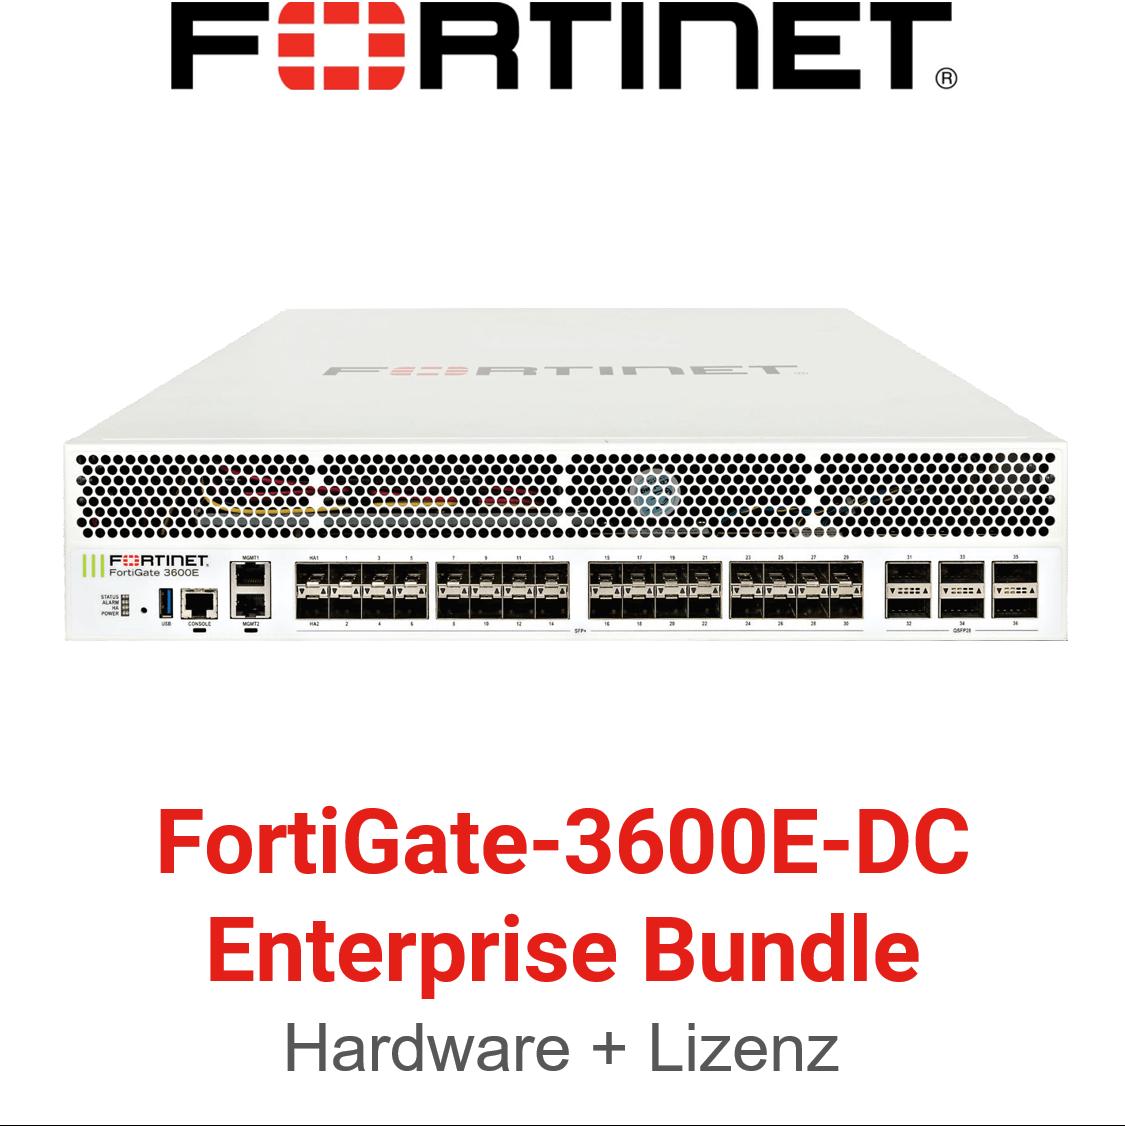 Fortinet FortiGate-3600E-DC - Enterprise Bundle (Hardware + Lizenz)